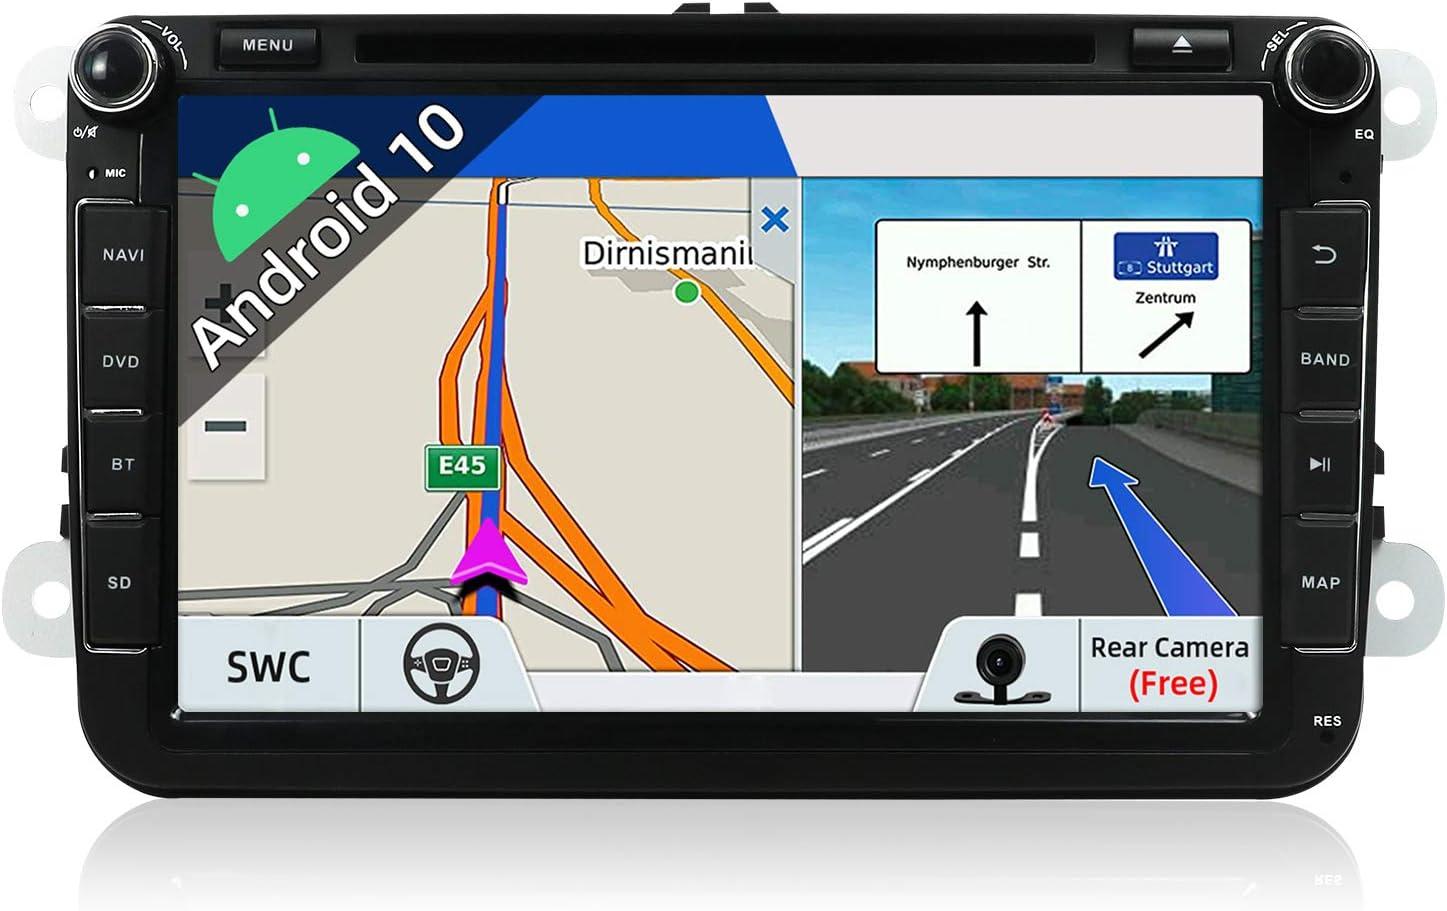 "JOYX Android 10 Autoradio 2 Din Car Stereo Compatible para VW SEAT SKODA POLO PASSAT TIGUAN GOLF Fabia Navegacion | 8"" | 2G+32G | LIBRE Cámara trasera Canbus |Soporte DAB 4G WIFI Bluetooth Carplay SWC"